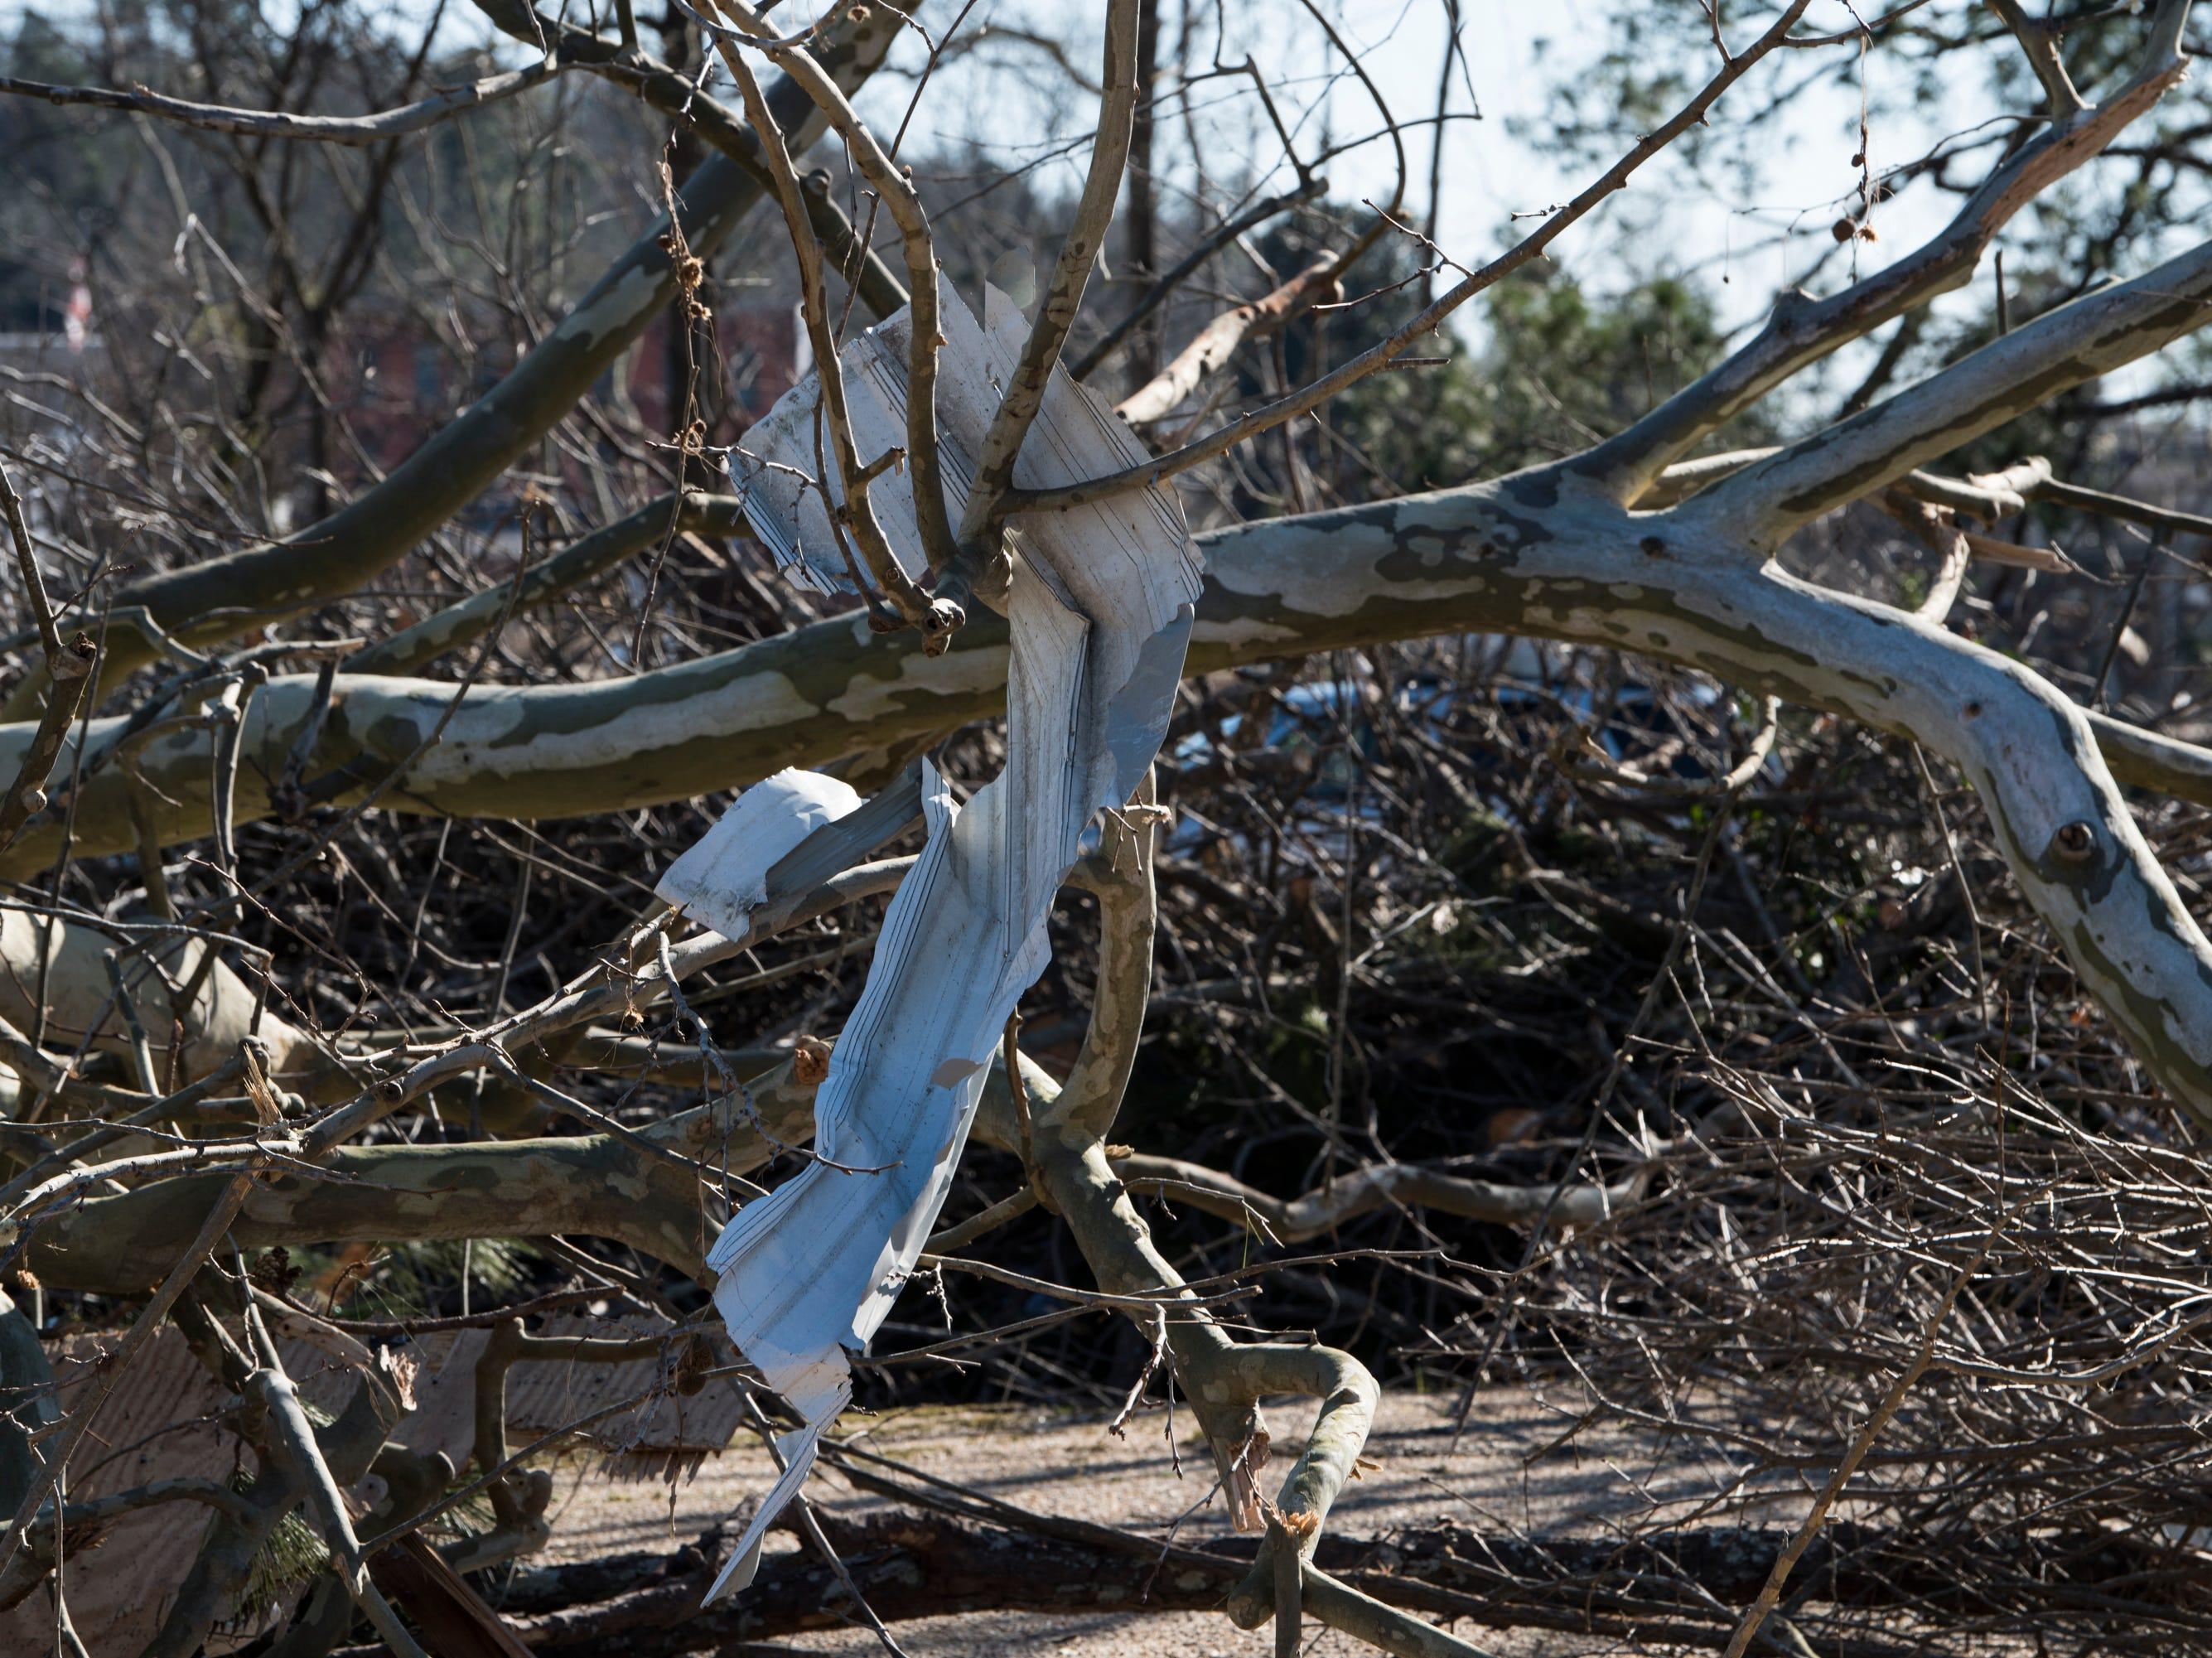 Tornado damage in Wetumpka, Ala., on Monday, Jan. 21, 2019.